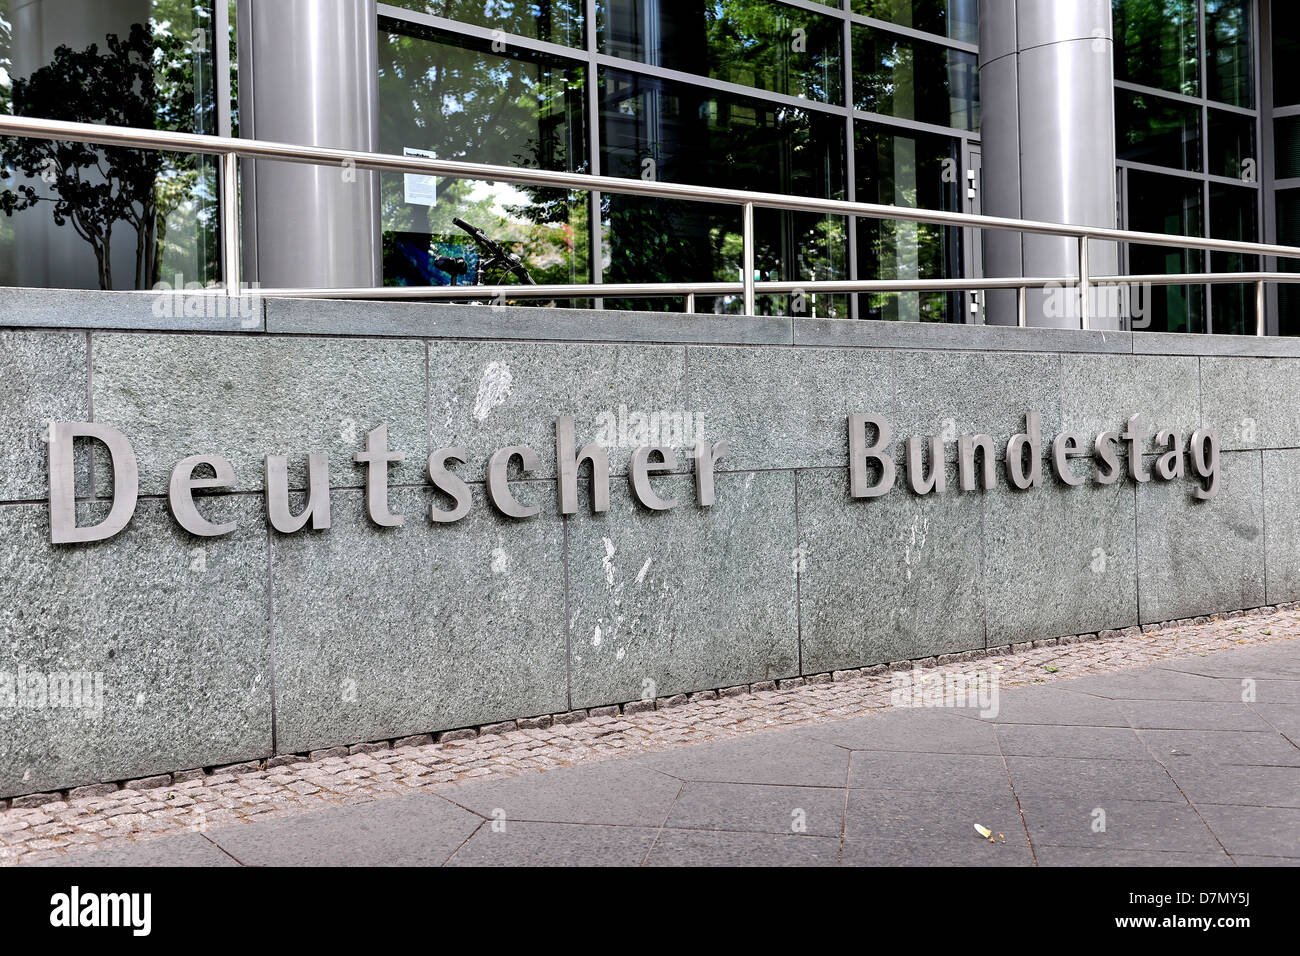 German Bundestag in Berlin - Stock Image